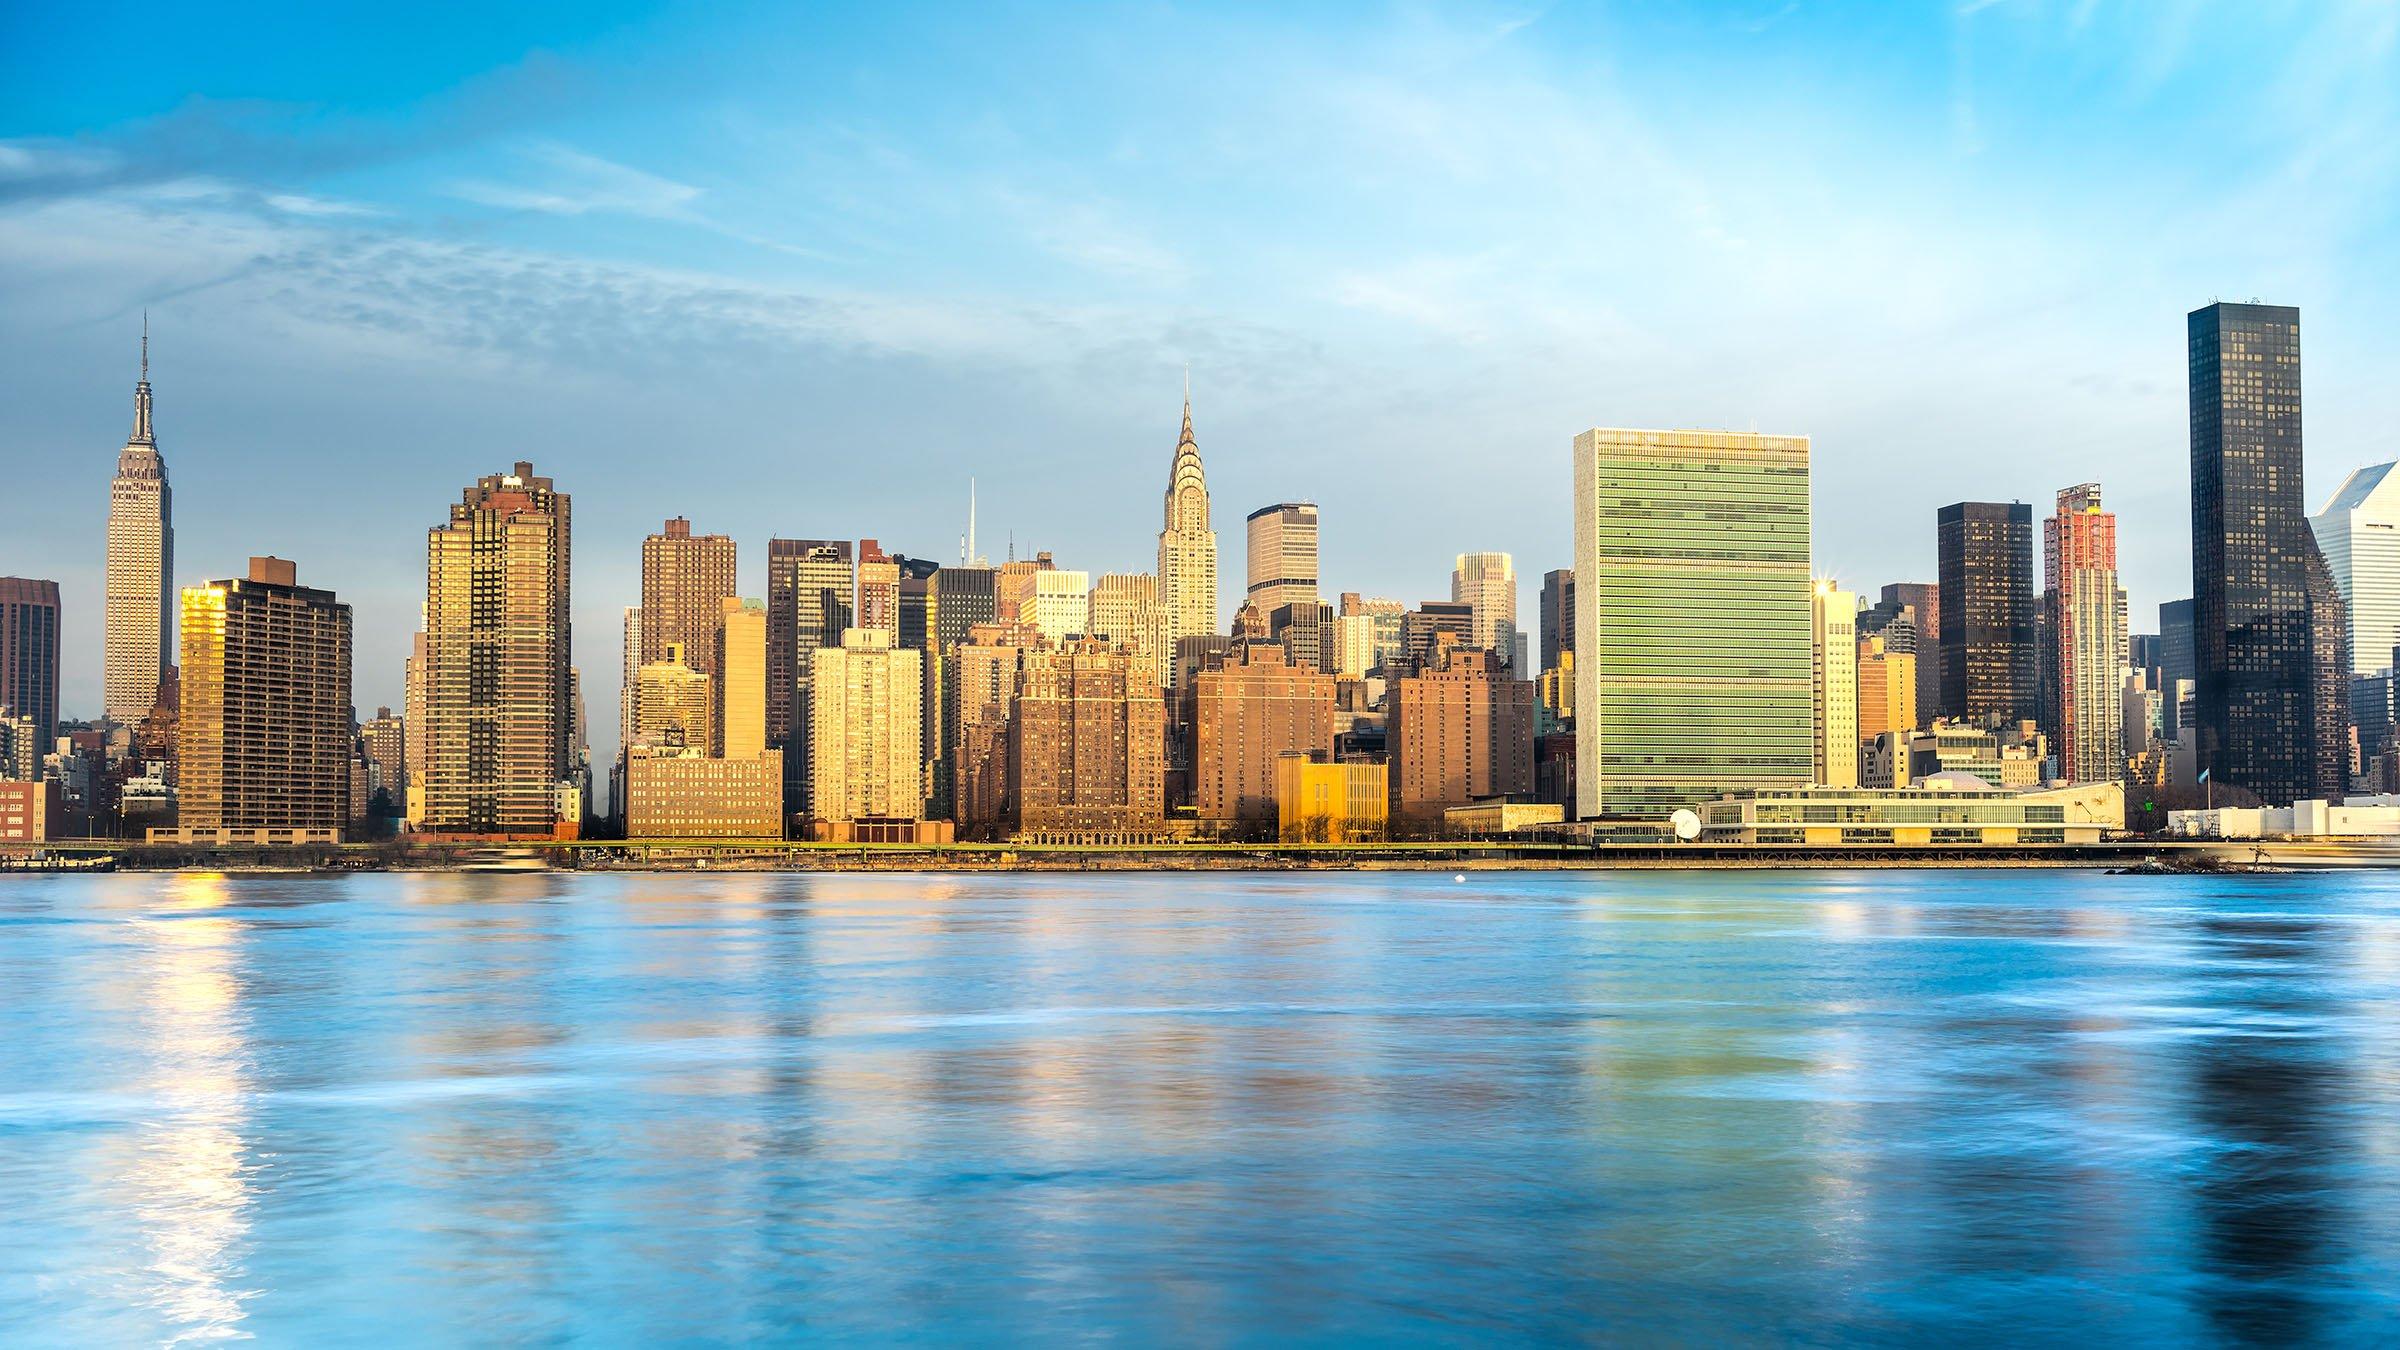 Midtown de Manhattan en Nueva York